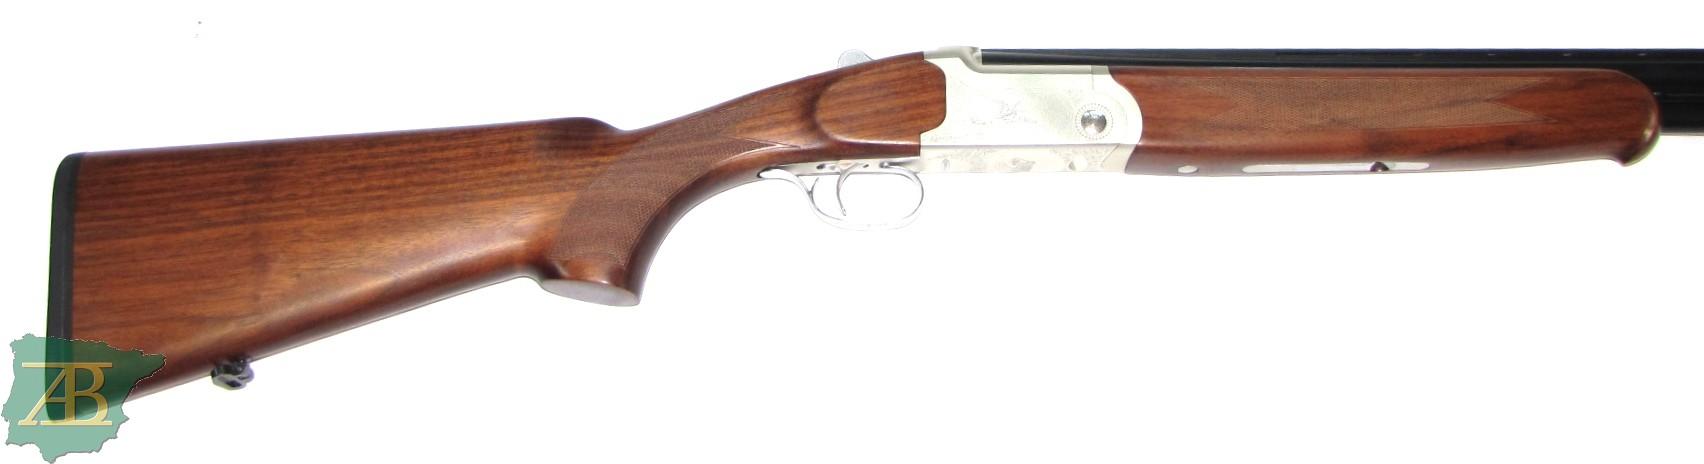 Escopeta superpuesta de caza KRICO Ref 5788-armeriaiberica-2